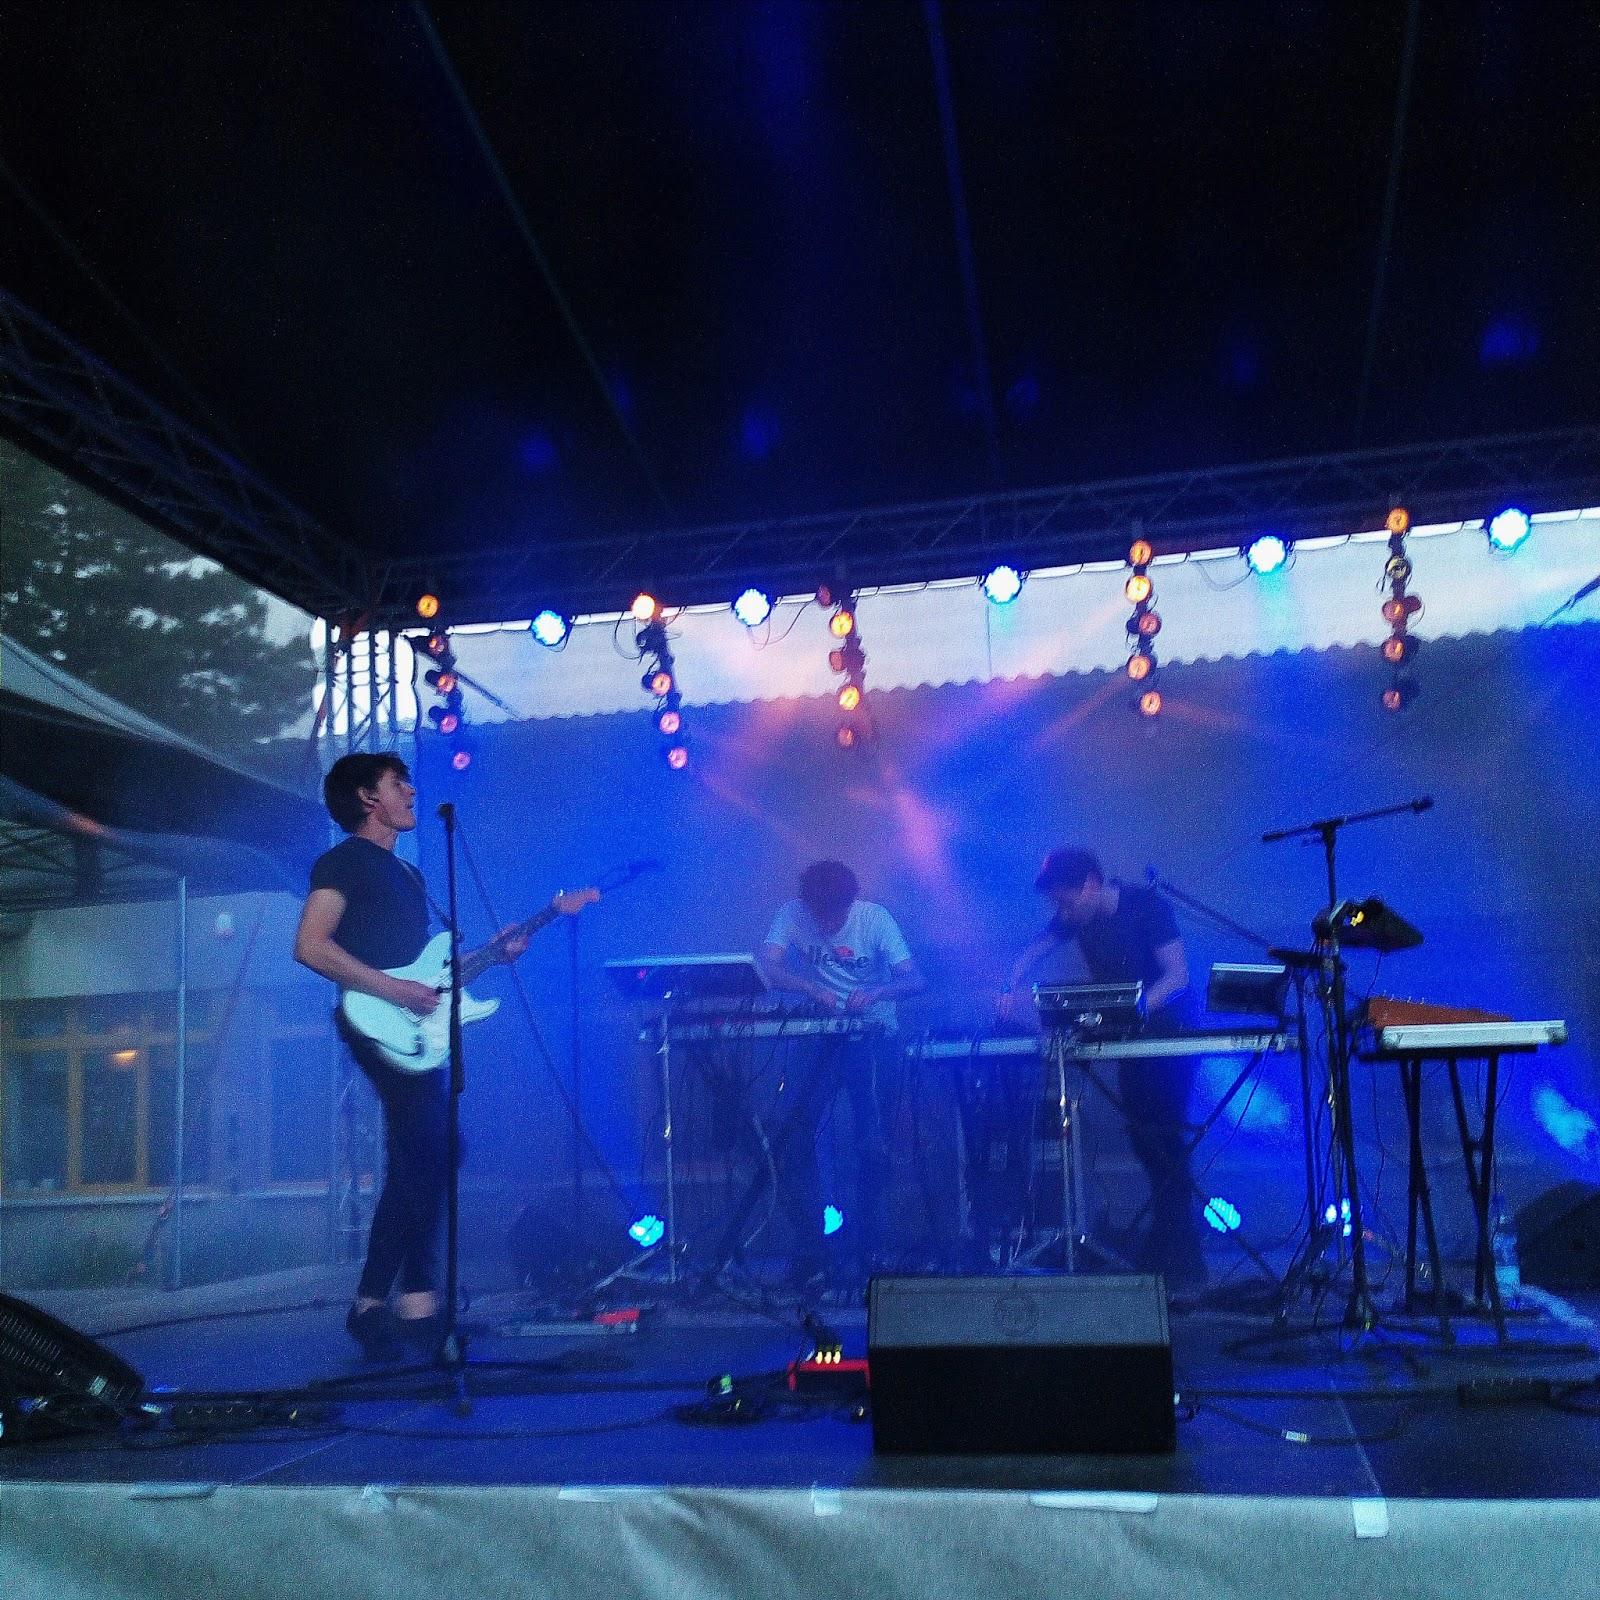 Koncert KAMP! na festivalu Wonderpark v Brně